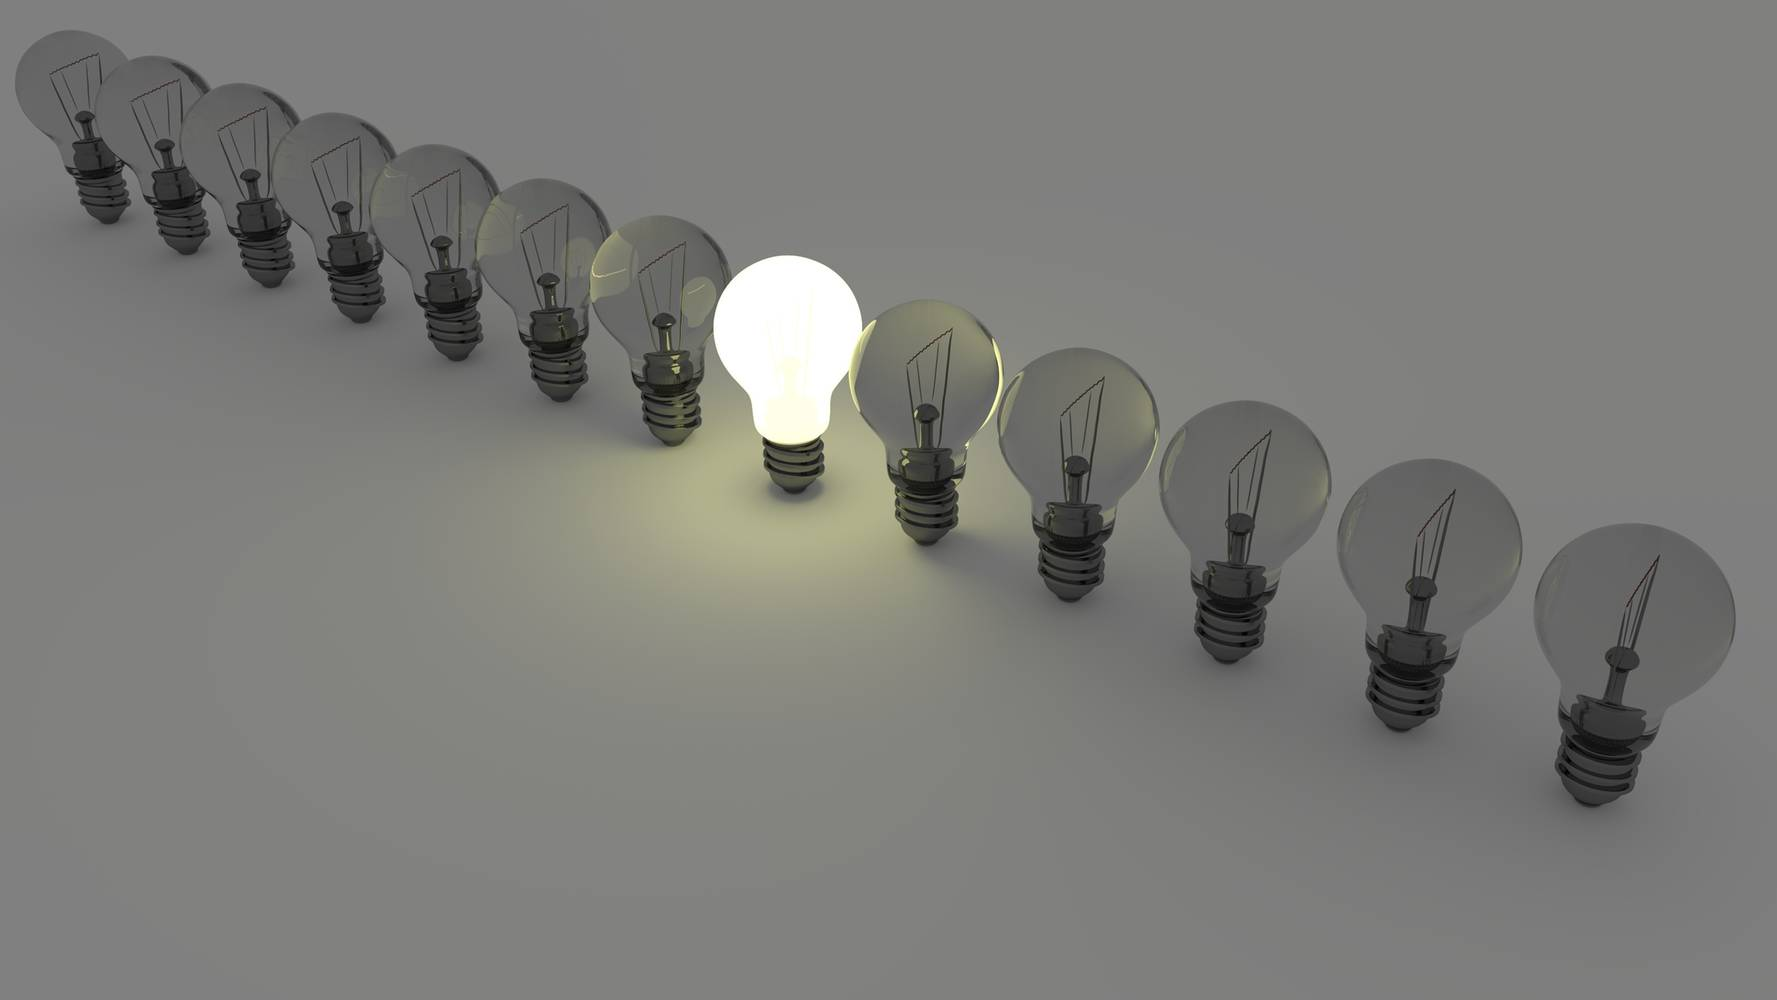 lichtplan laten maken kosten